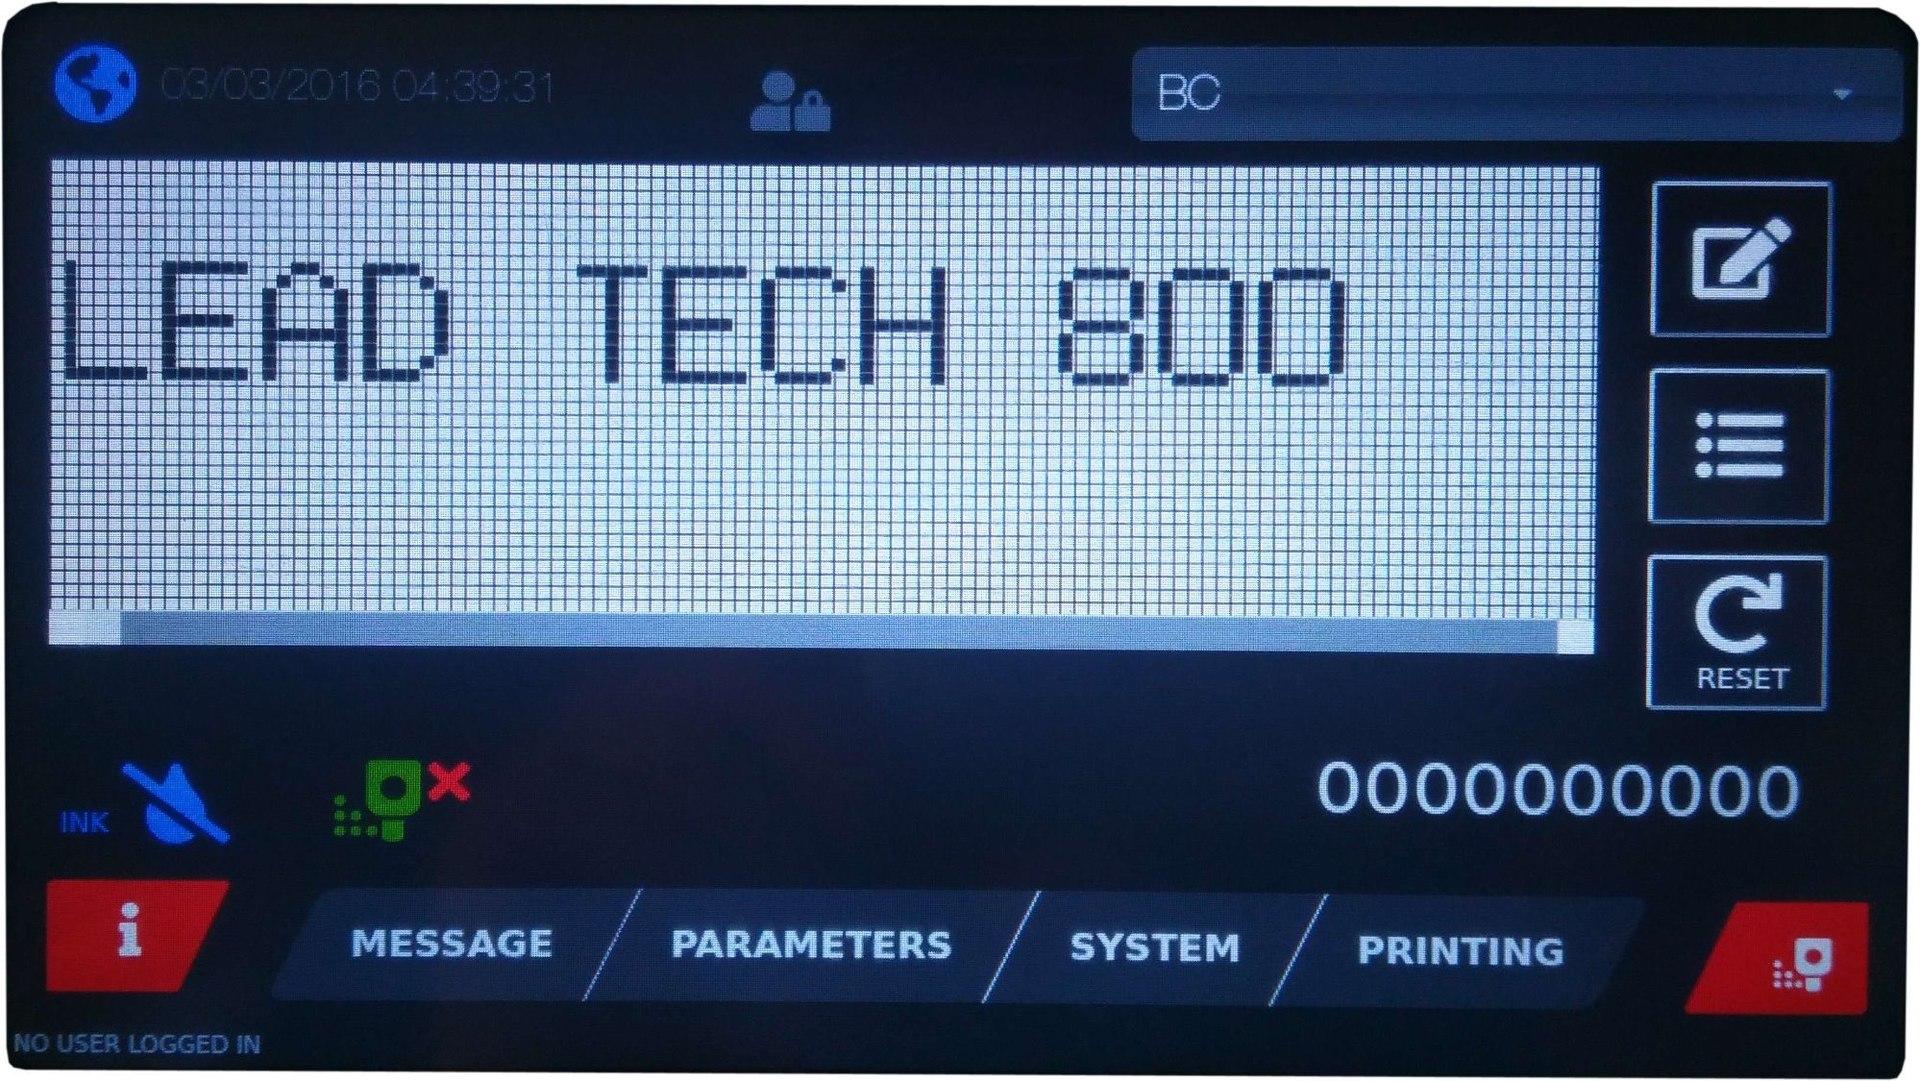 Lead Tech Lt800 Plastic Bottle Cap Cij Inkjet Printer